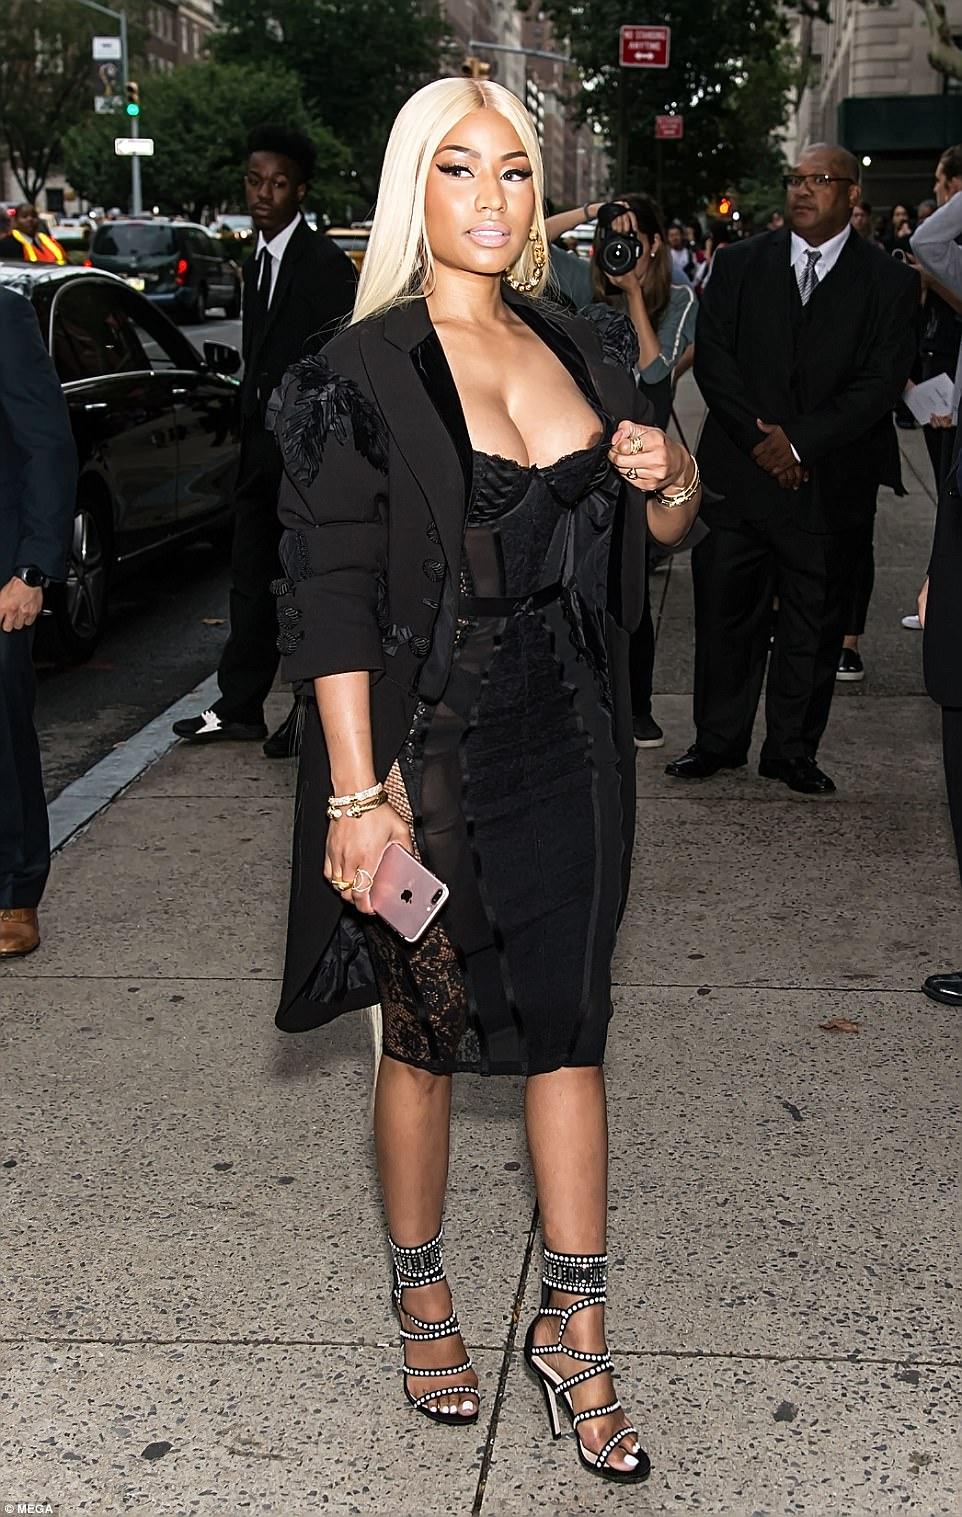 Nicki Minaj suffers an embarrassing nip slip as she